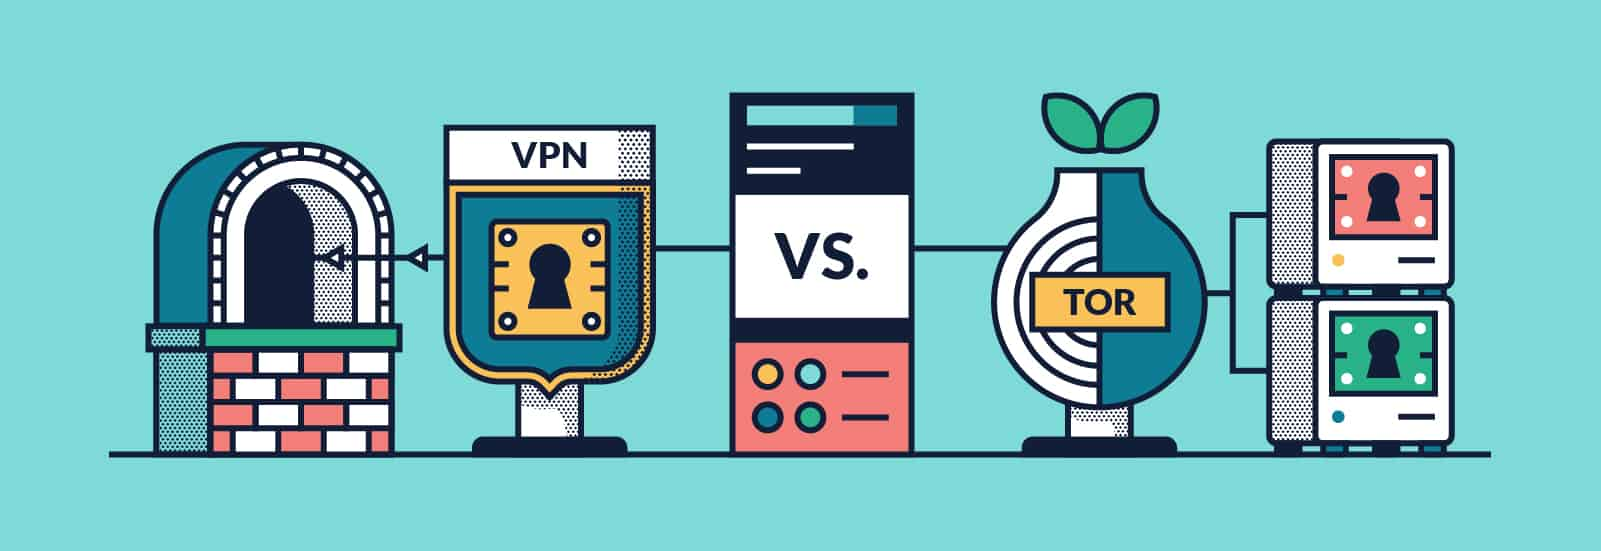 Tor vs. VPN: The Verdict